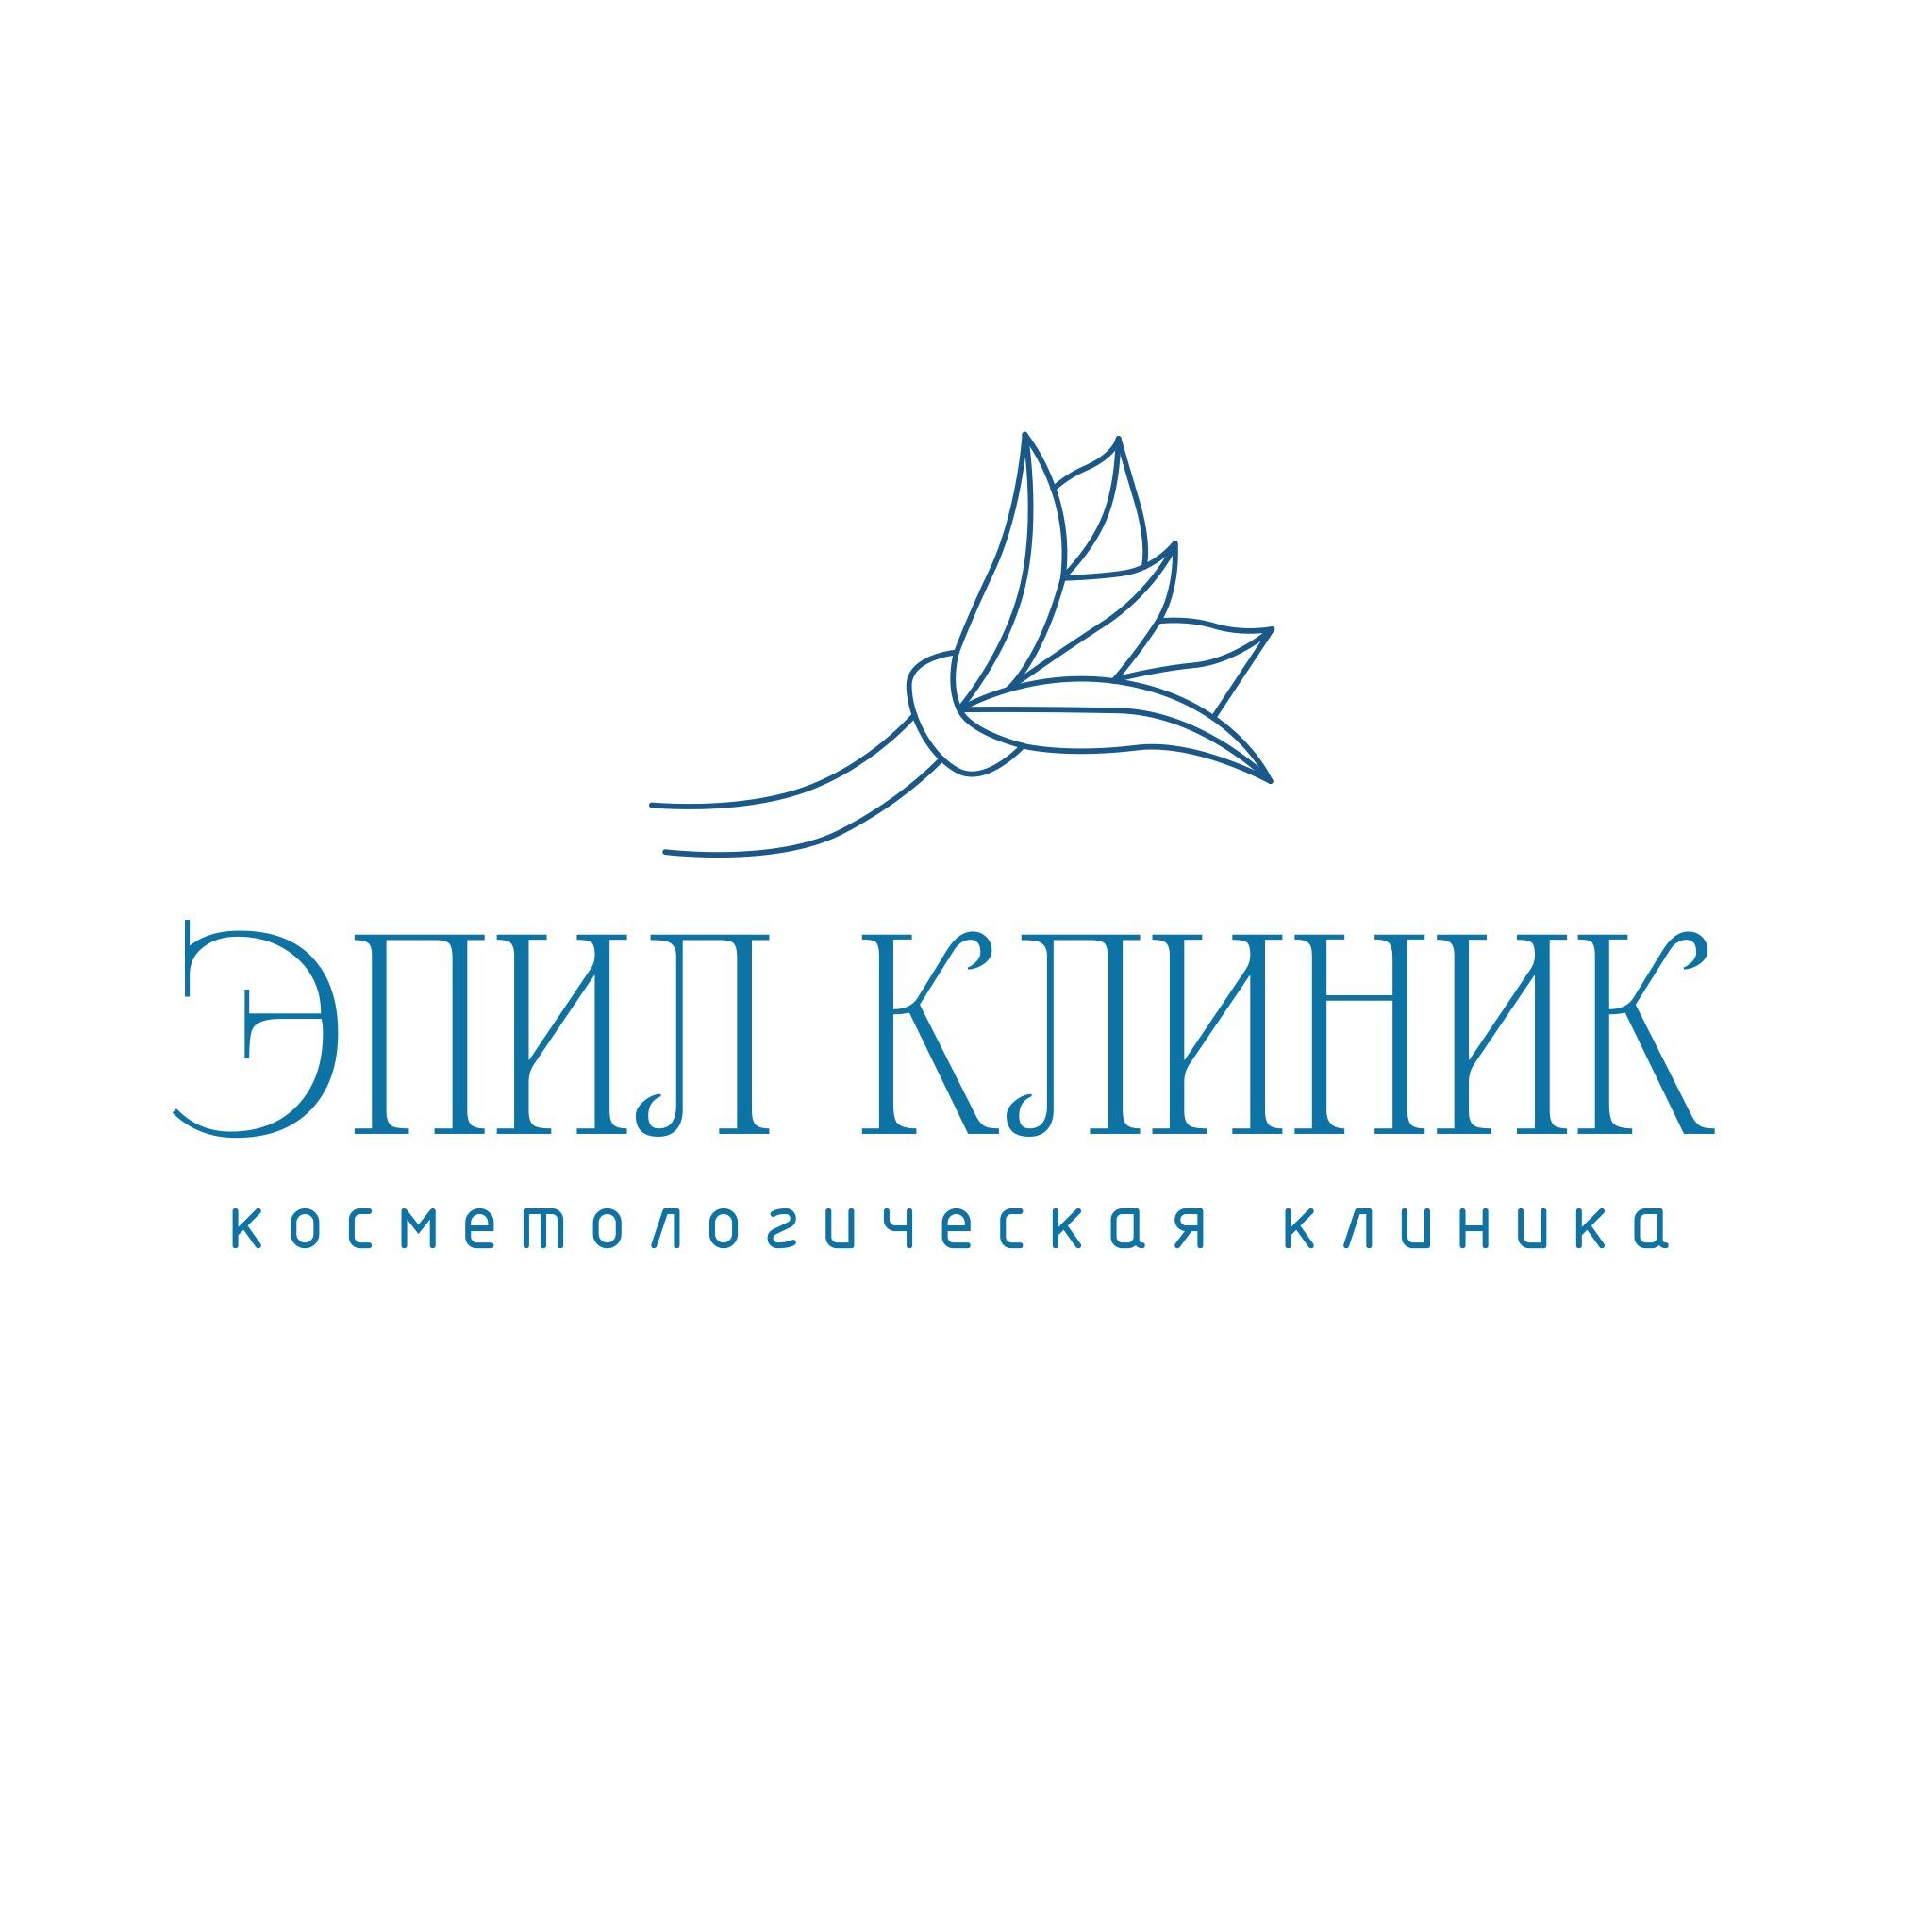 Логотип , фирменный стиль  фото f_0195e19df03e3bc6.jpg